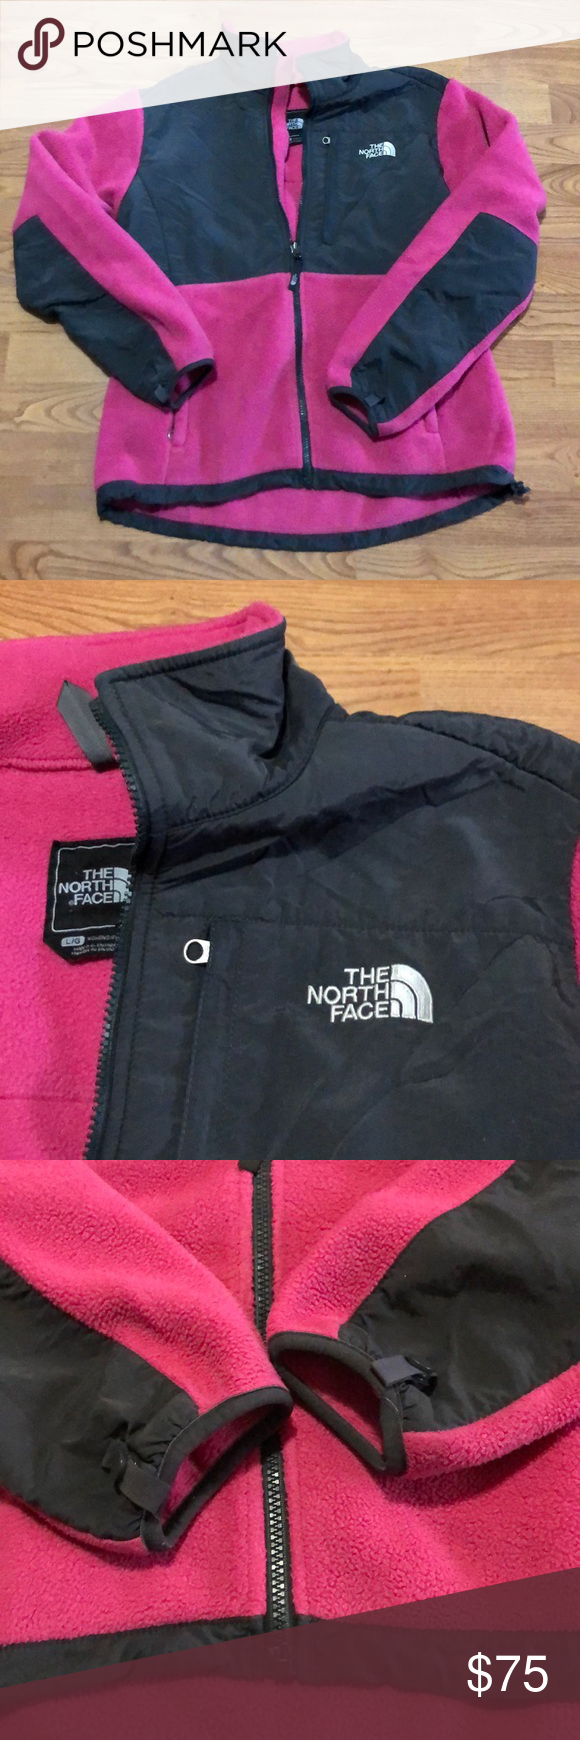 Northface Pink And Grey Denali Jacket Large The North Face Soft Shell Jacket Jackets [ 1740 x 580 Pixel ]